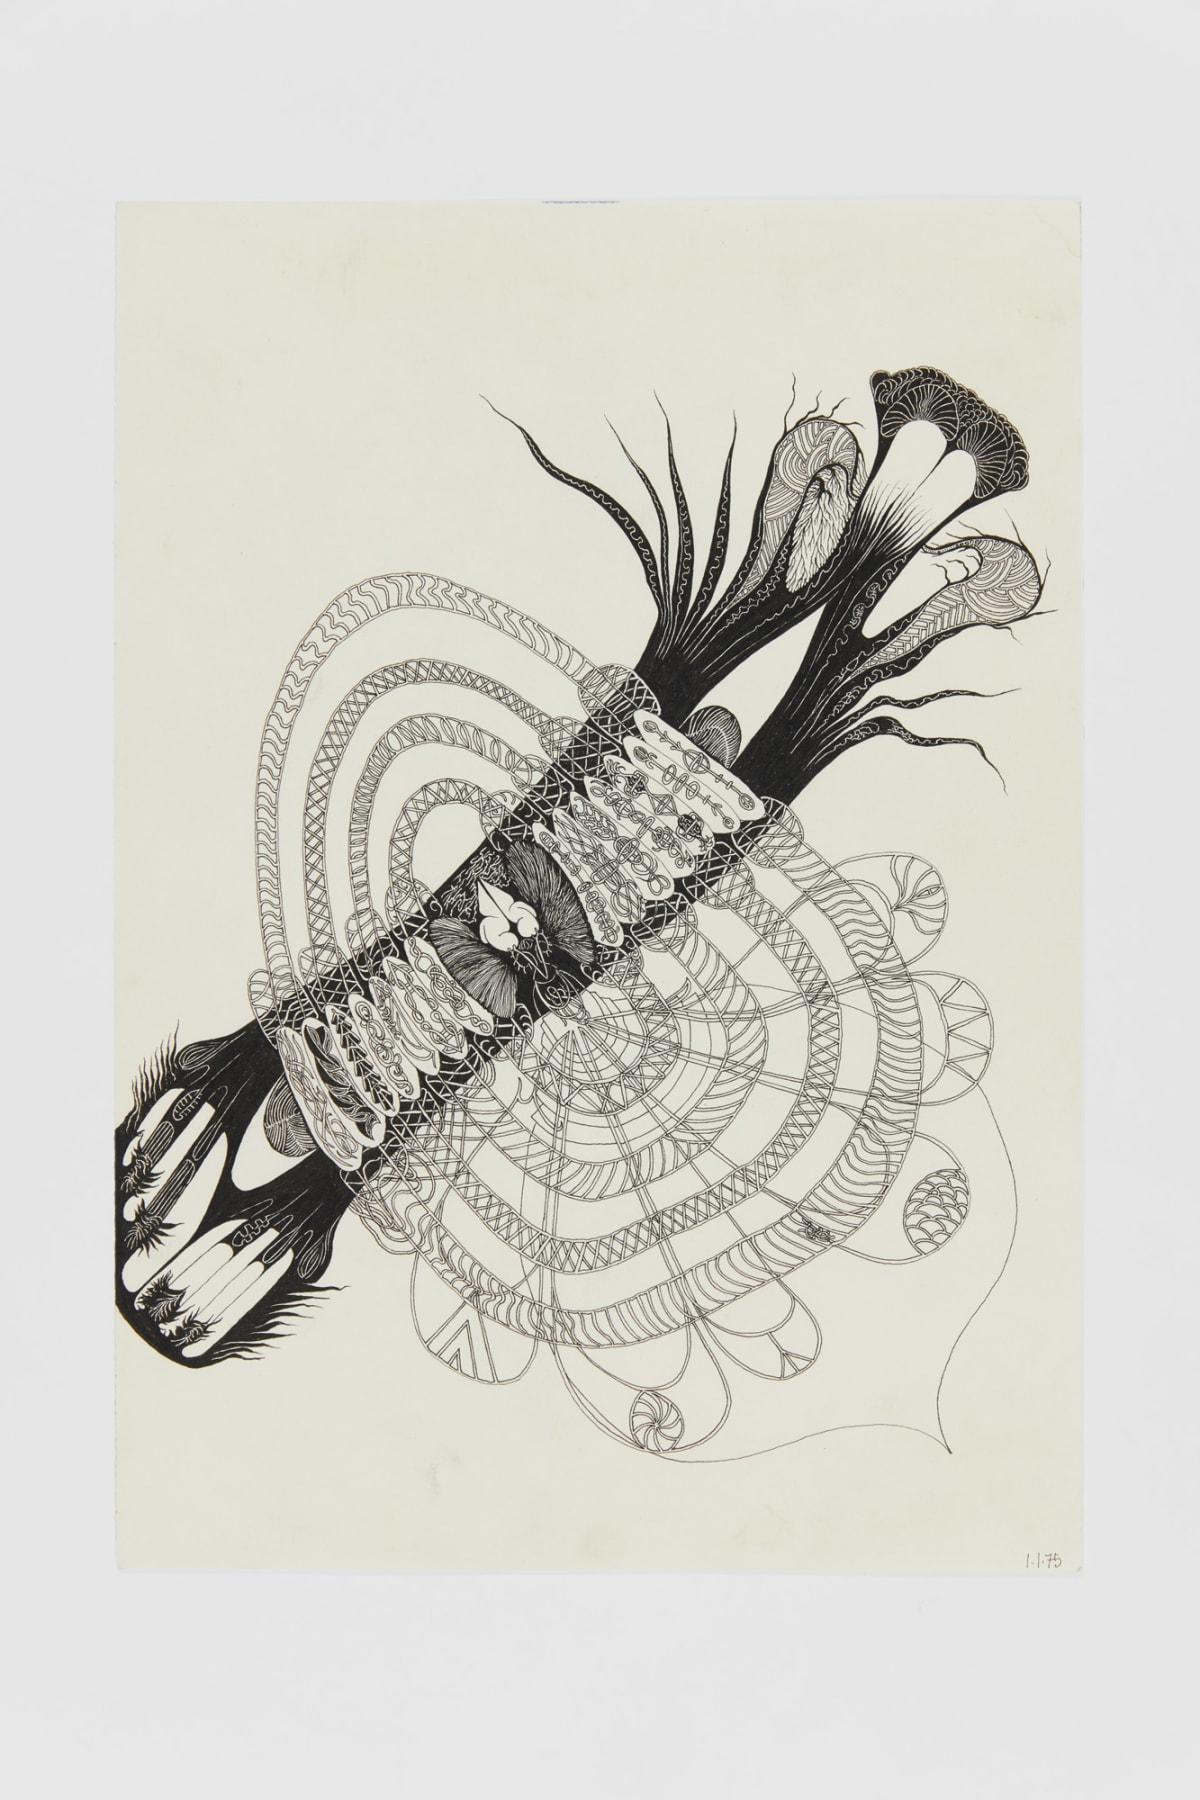 Ann CHURCHILL 1.1.75 (Daily drawings), 1975 Pen on paper 29.7 x 20.9 cm